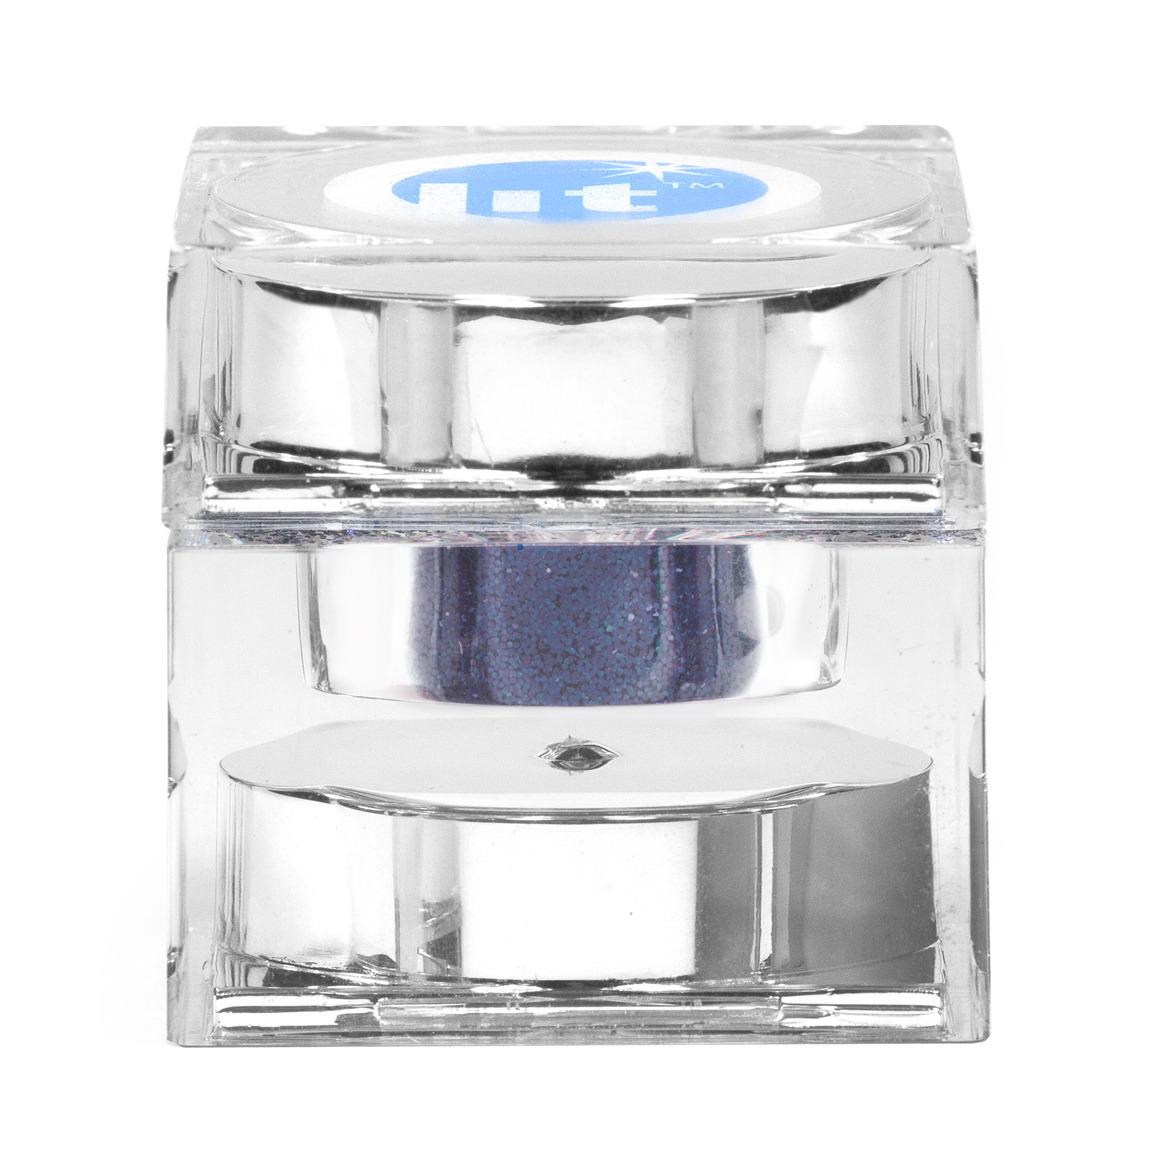 Lit Cosmetics Lit Glitter In The Navy S3 alternative view 1.